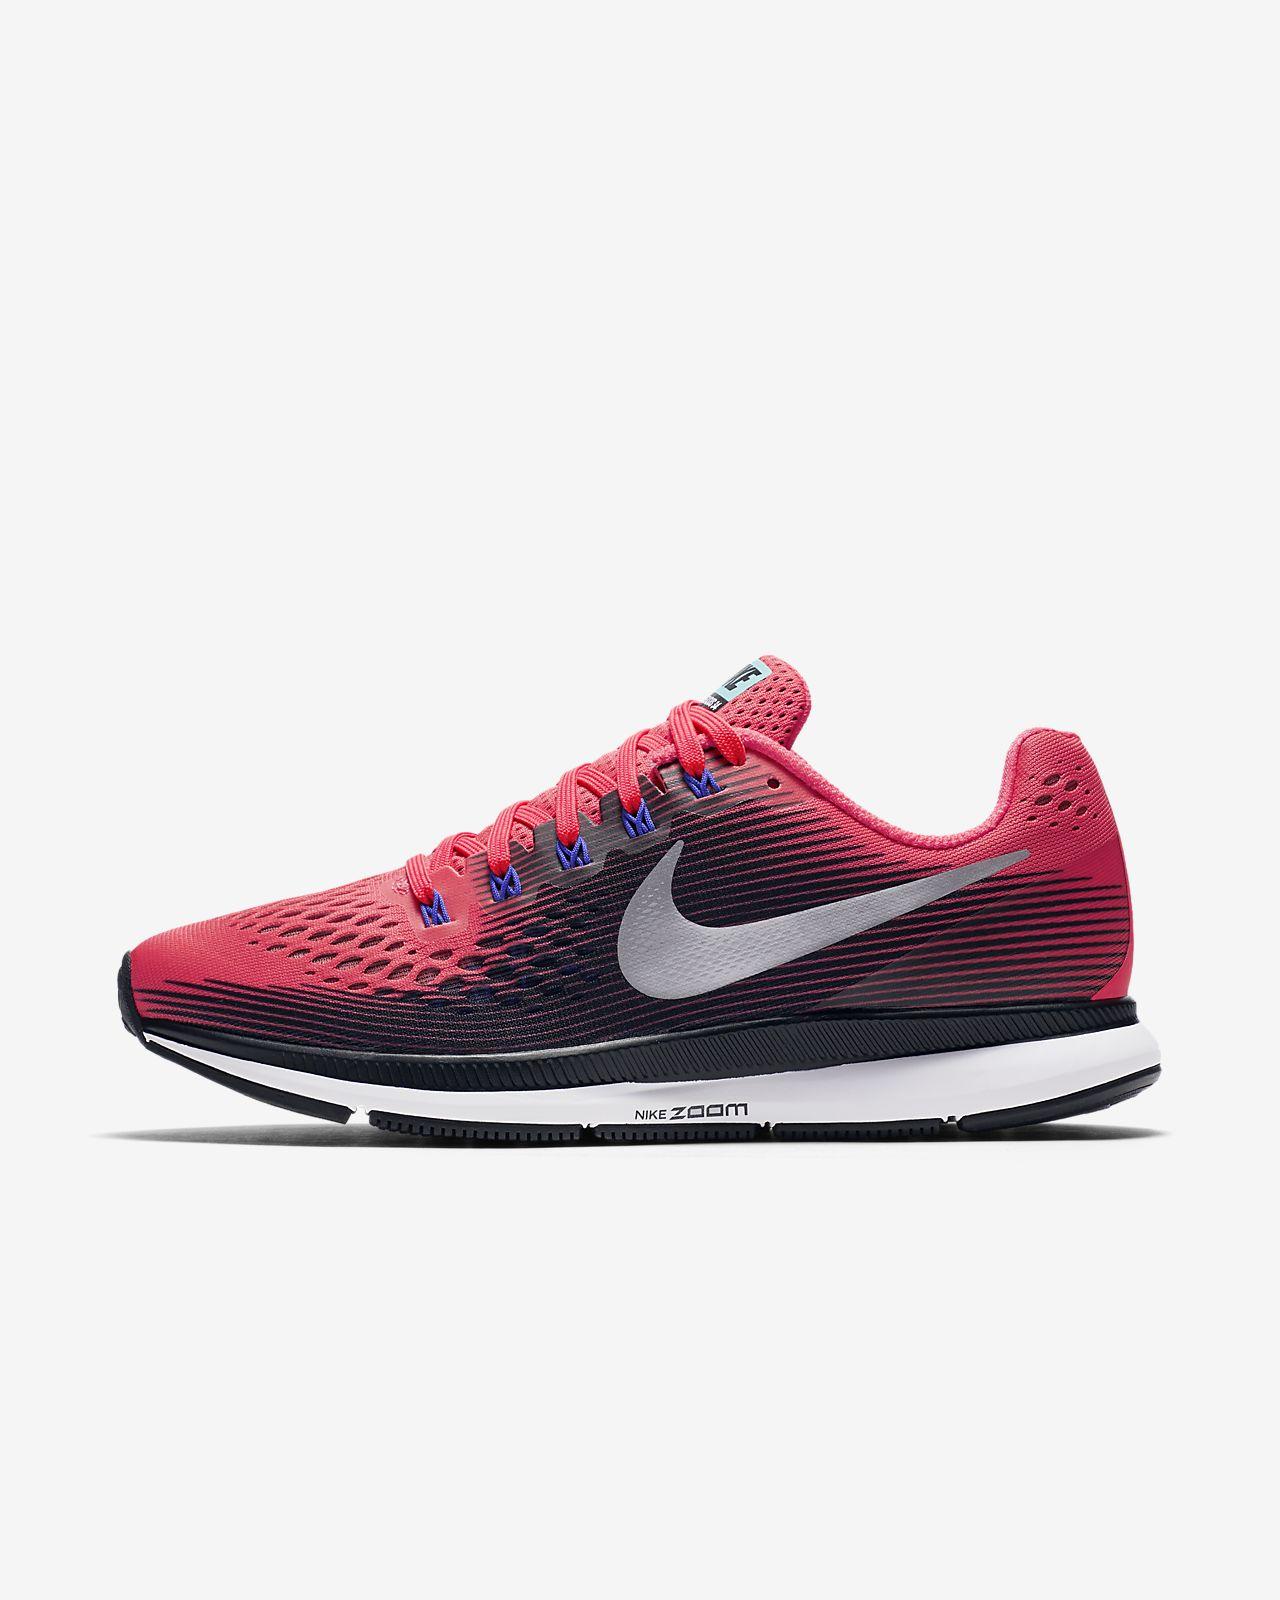 Chaussure de running Nike Air Zoom Pegasus 34 pour Femme